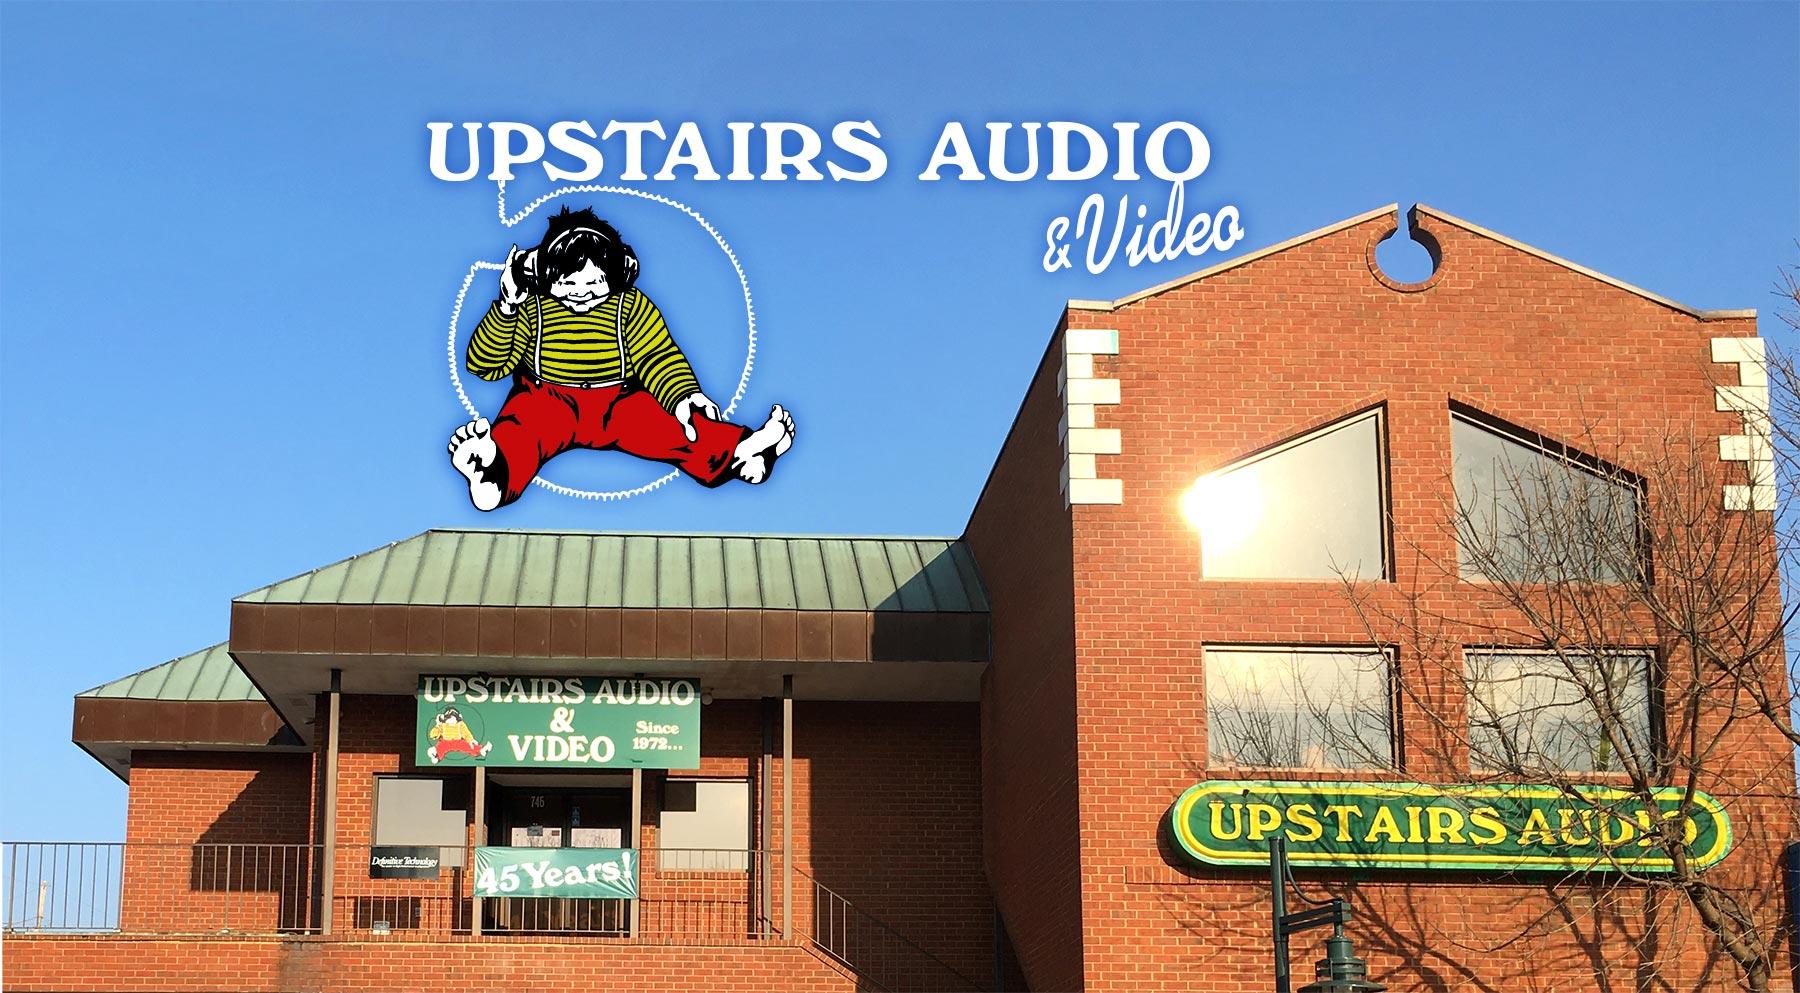 Upstairs Audio & Video